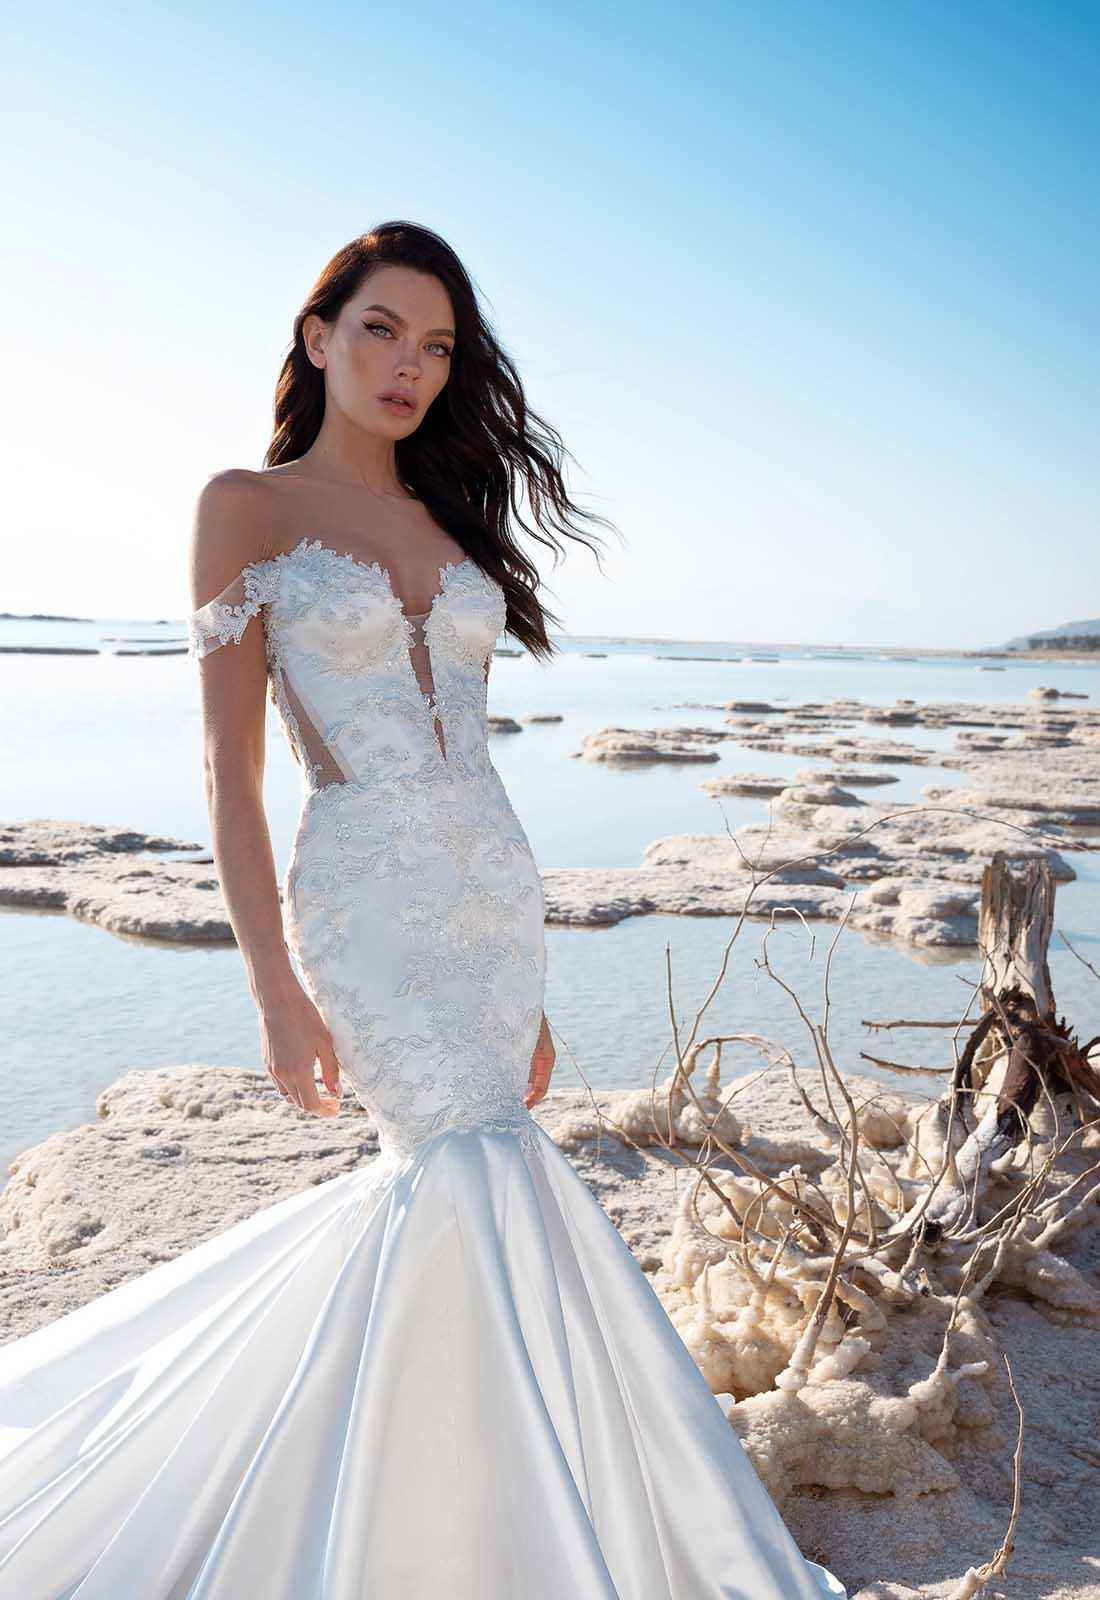 Pnina Tornai: See Through Wedding Dress Fashion At Reisefeber.org